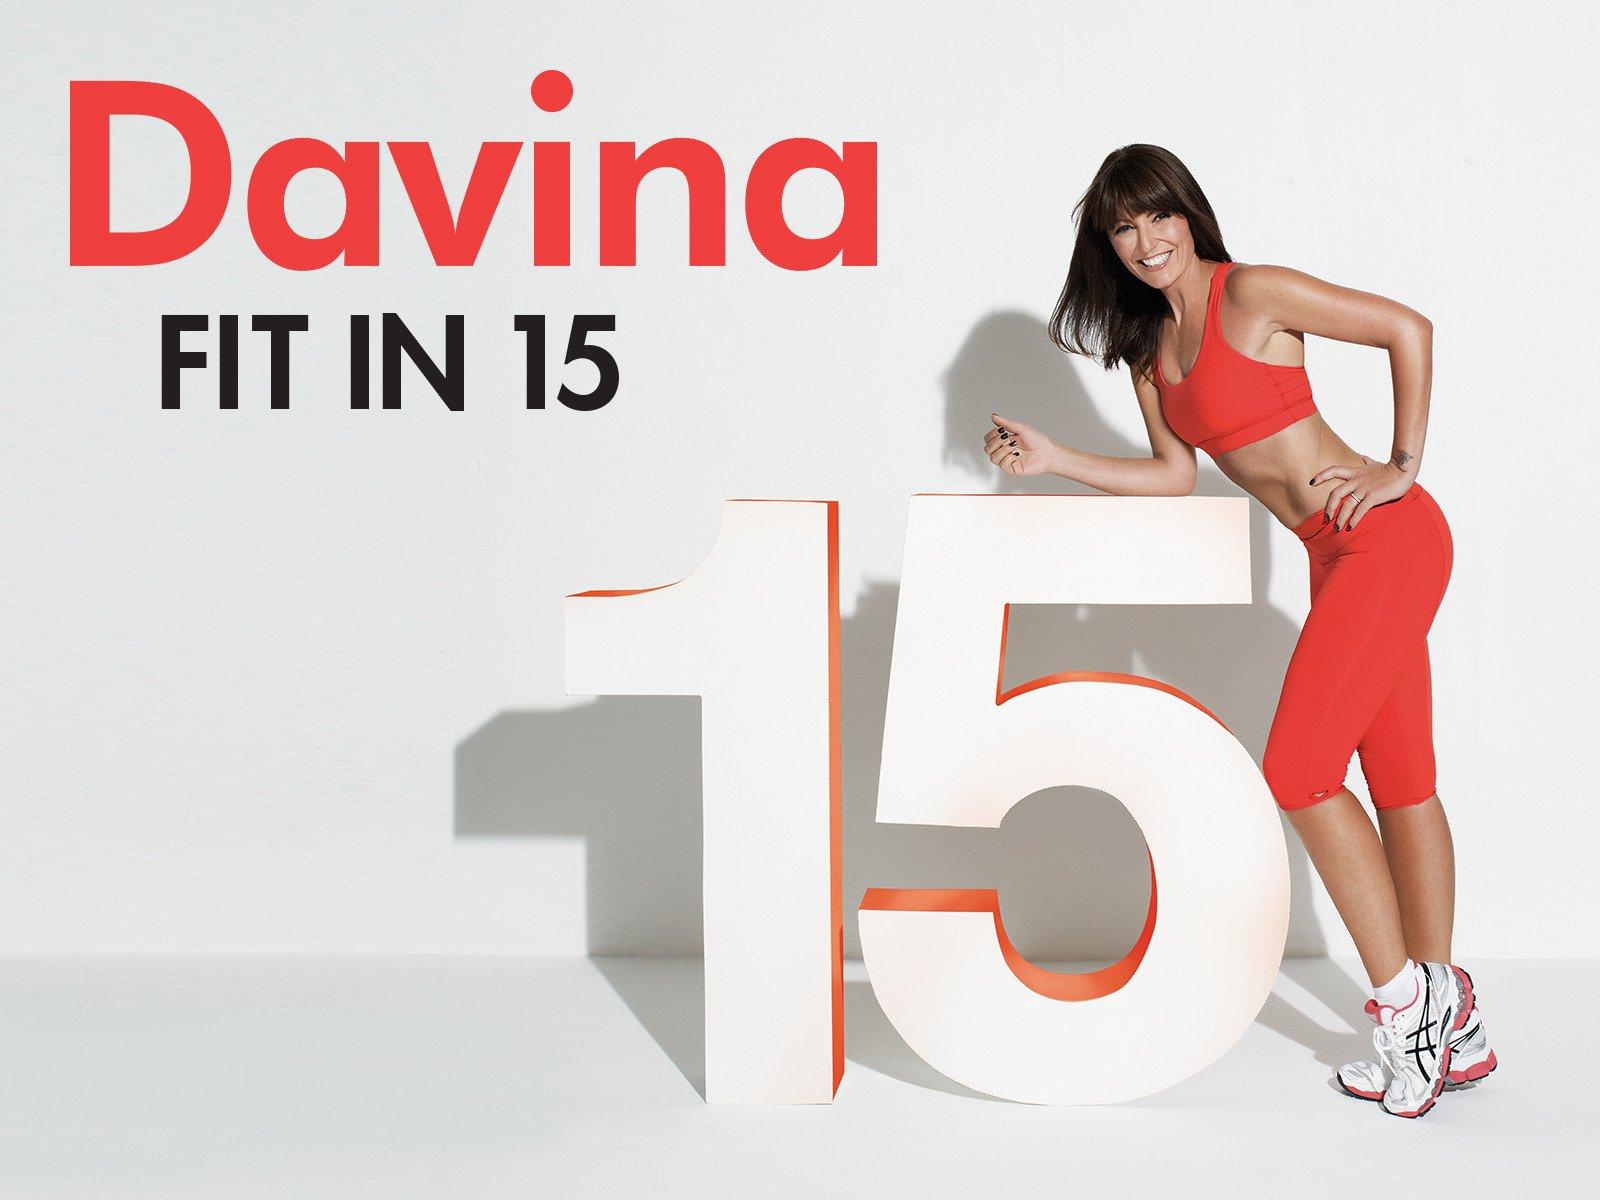 davina fit in 15 download free